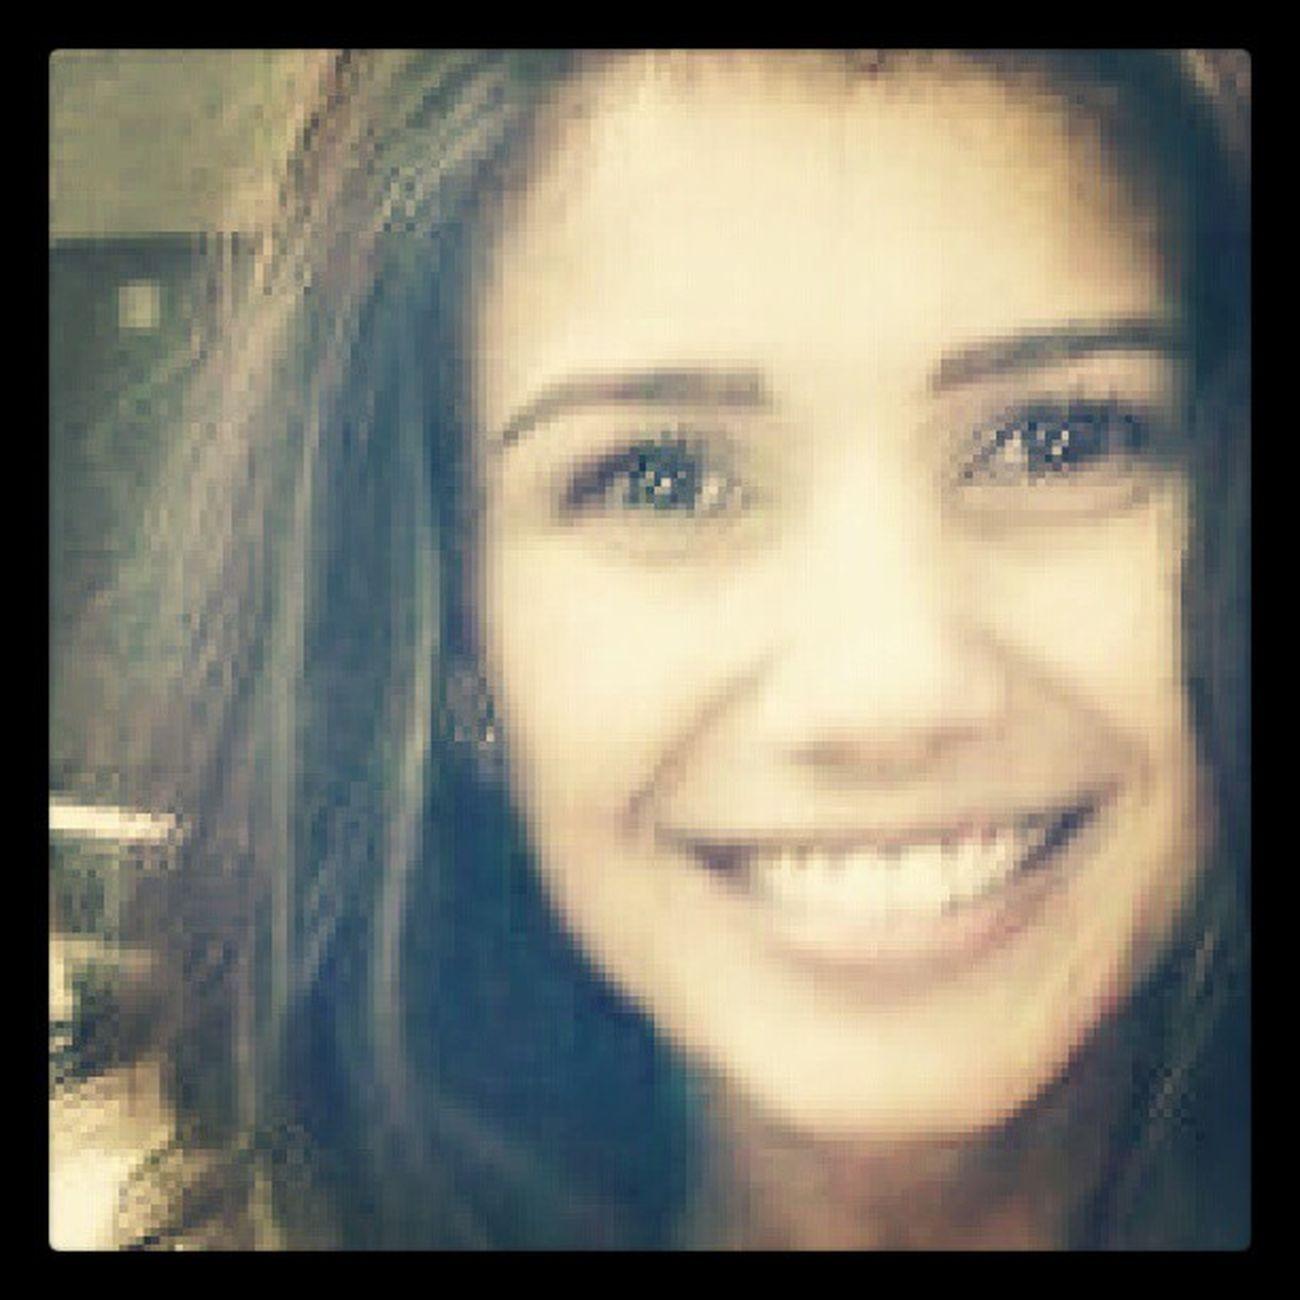 Lindaaaaaaaa! *-----* Existe sorriso mais lindo? E olhos mais lindos? Paulafernandes Vida Minha MeuSorriso MeuSol MeuAmor Linda Musica Sertanejo Brasil Beautiful Life Smile Music Brasil MPB My Love <3